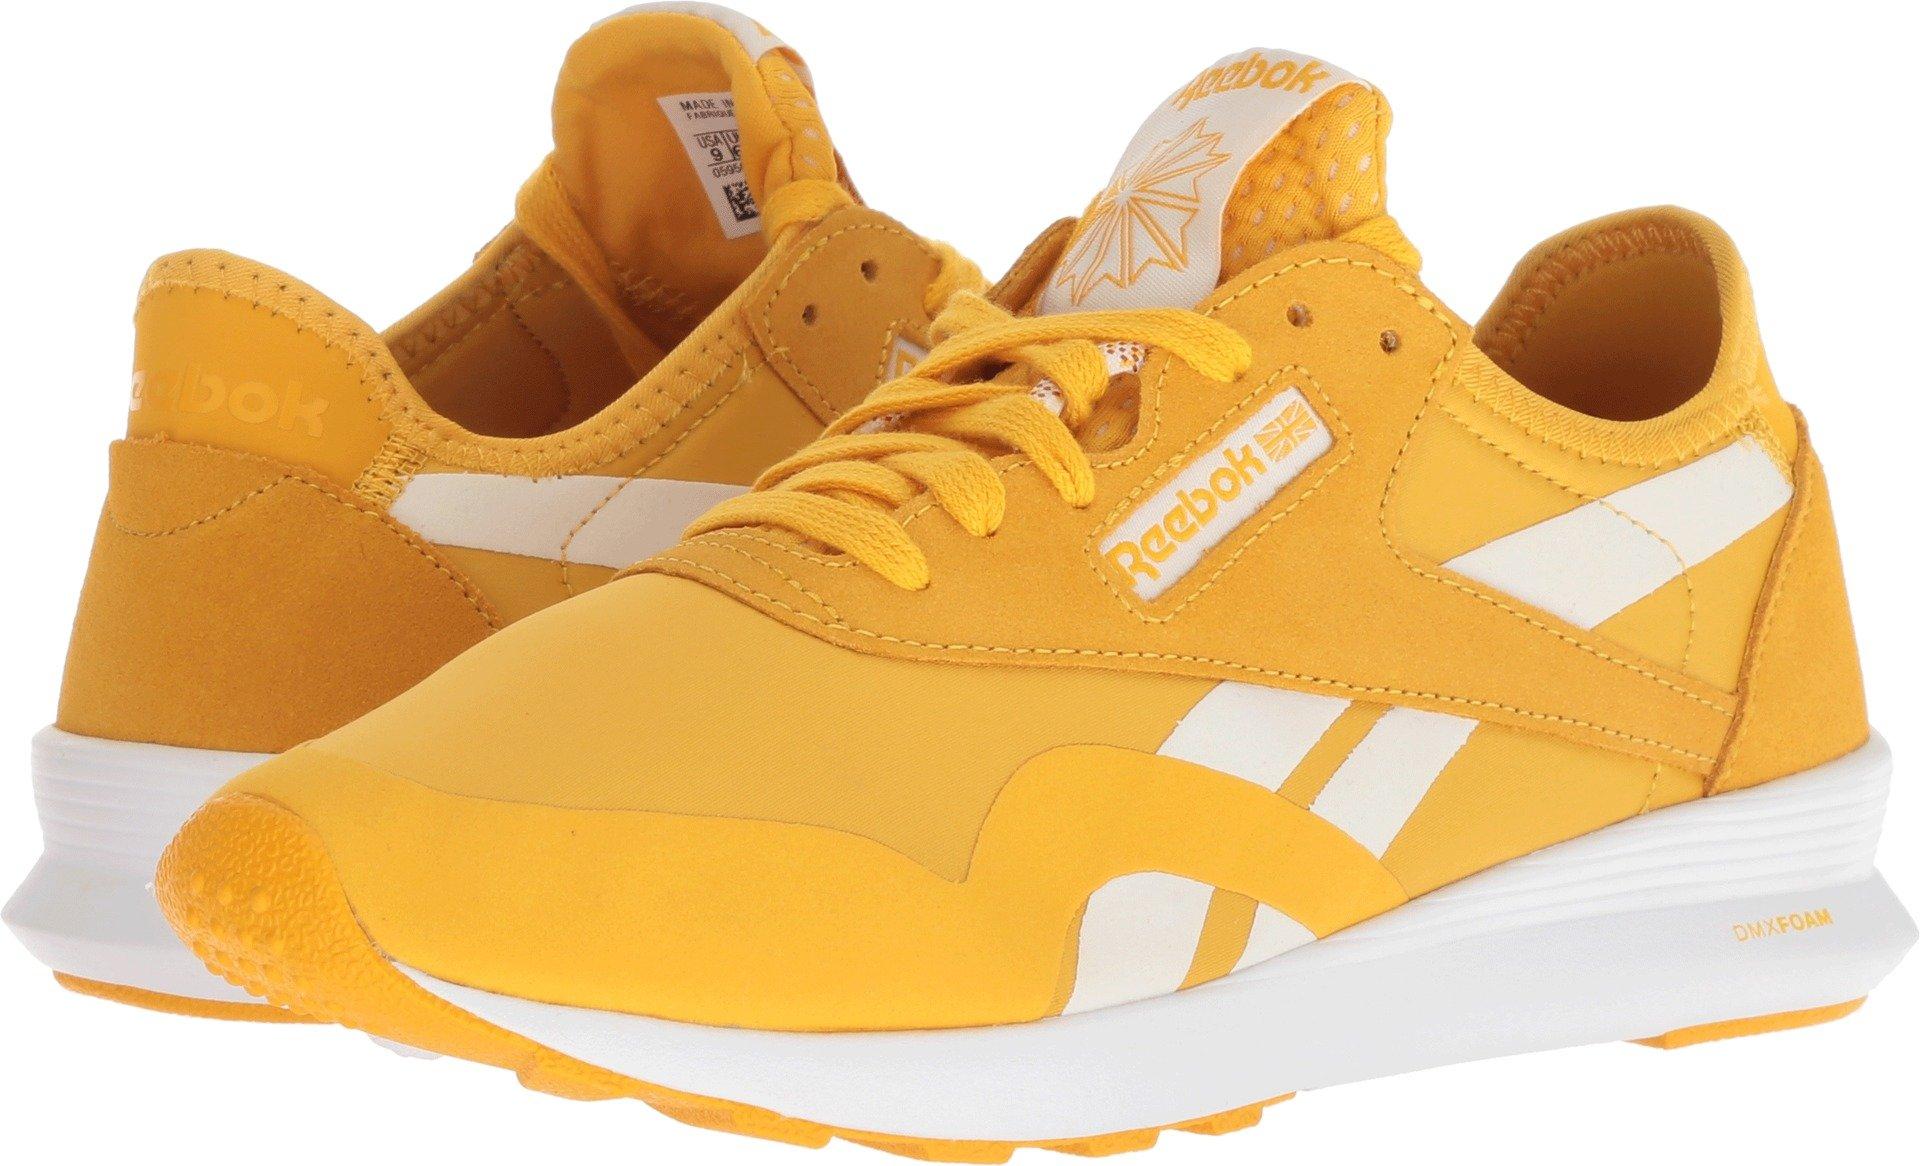 Reebok Women's Classic Nylon SP Walking Shoe, OG Blocking-Fierce Gold/Chalk/White, 7.5 M US